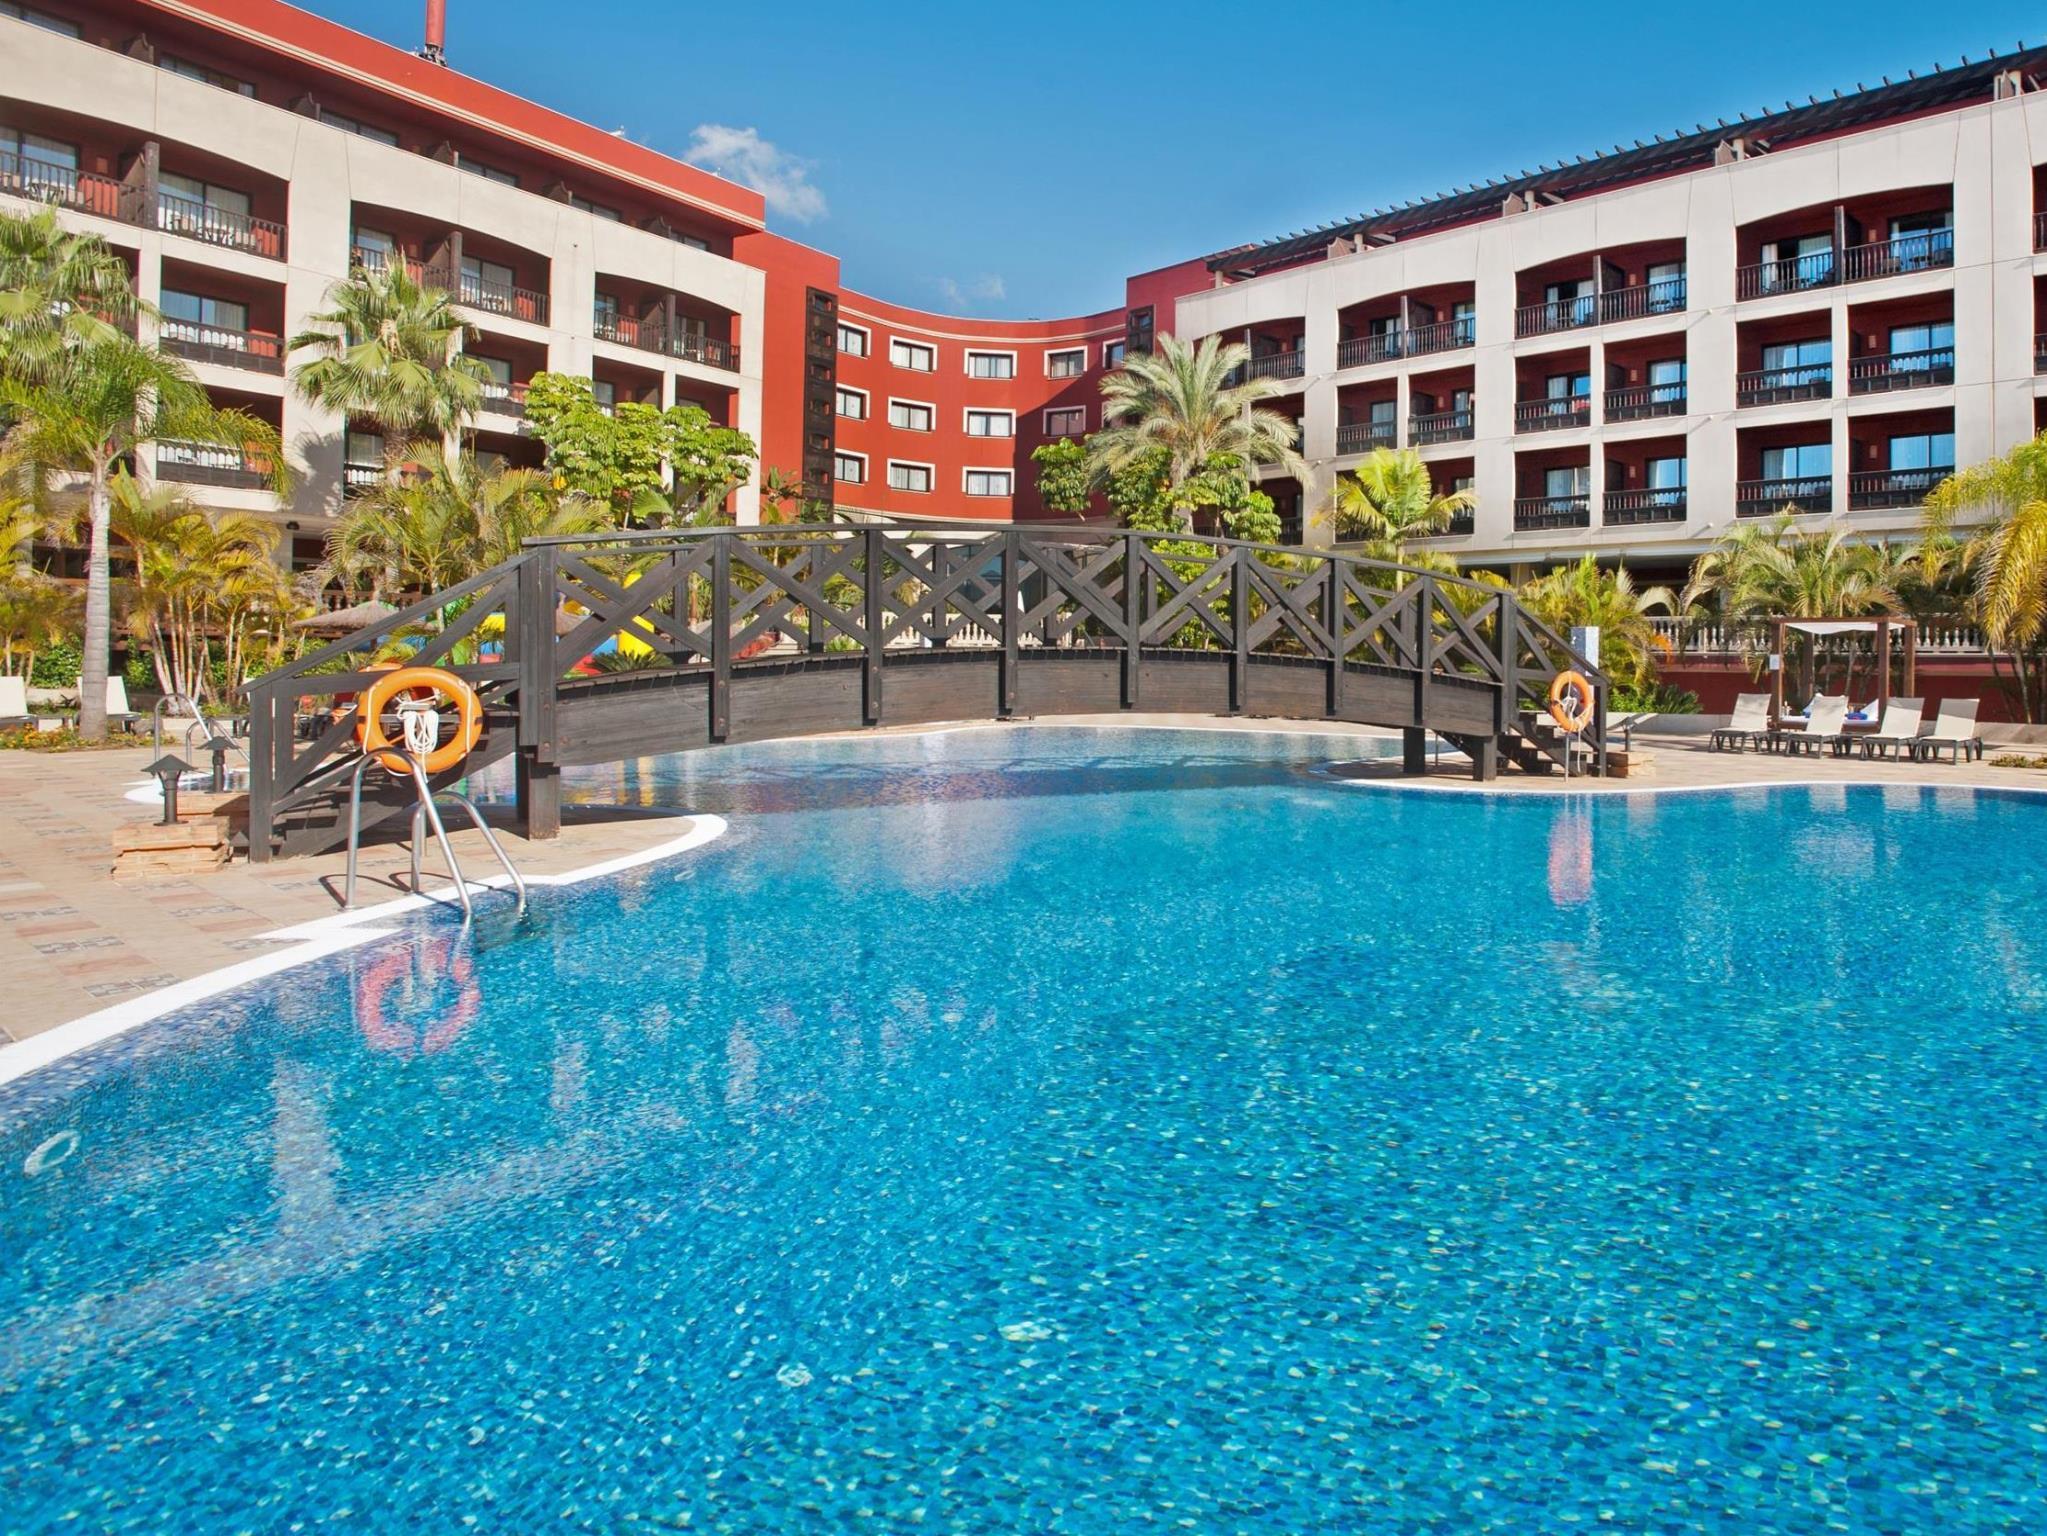 Hotel Barcelo Marbella